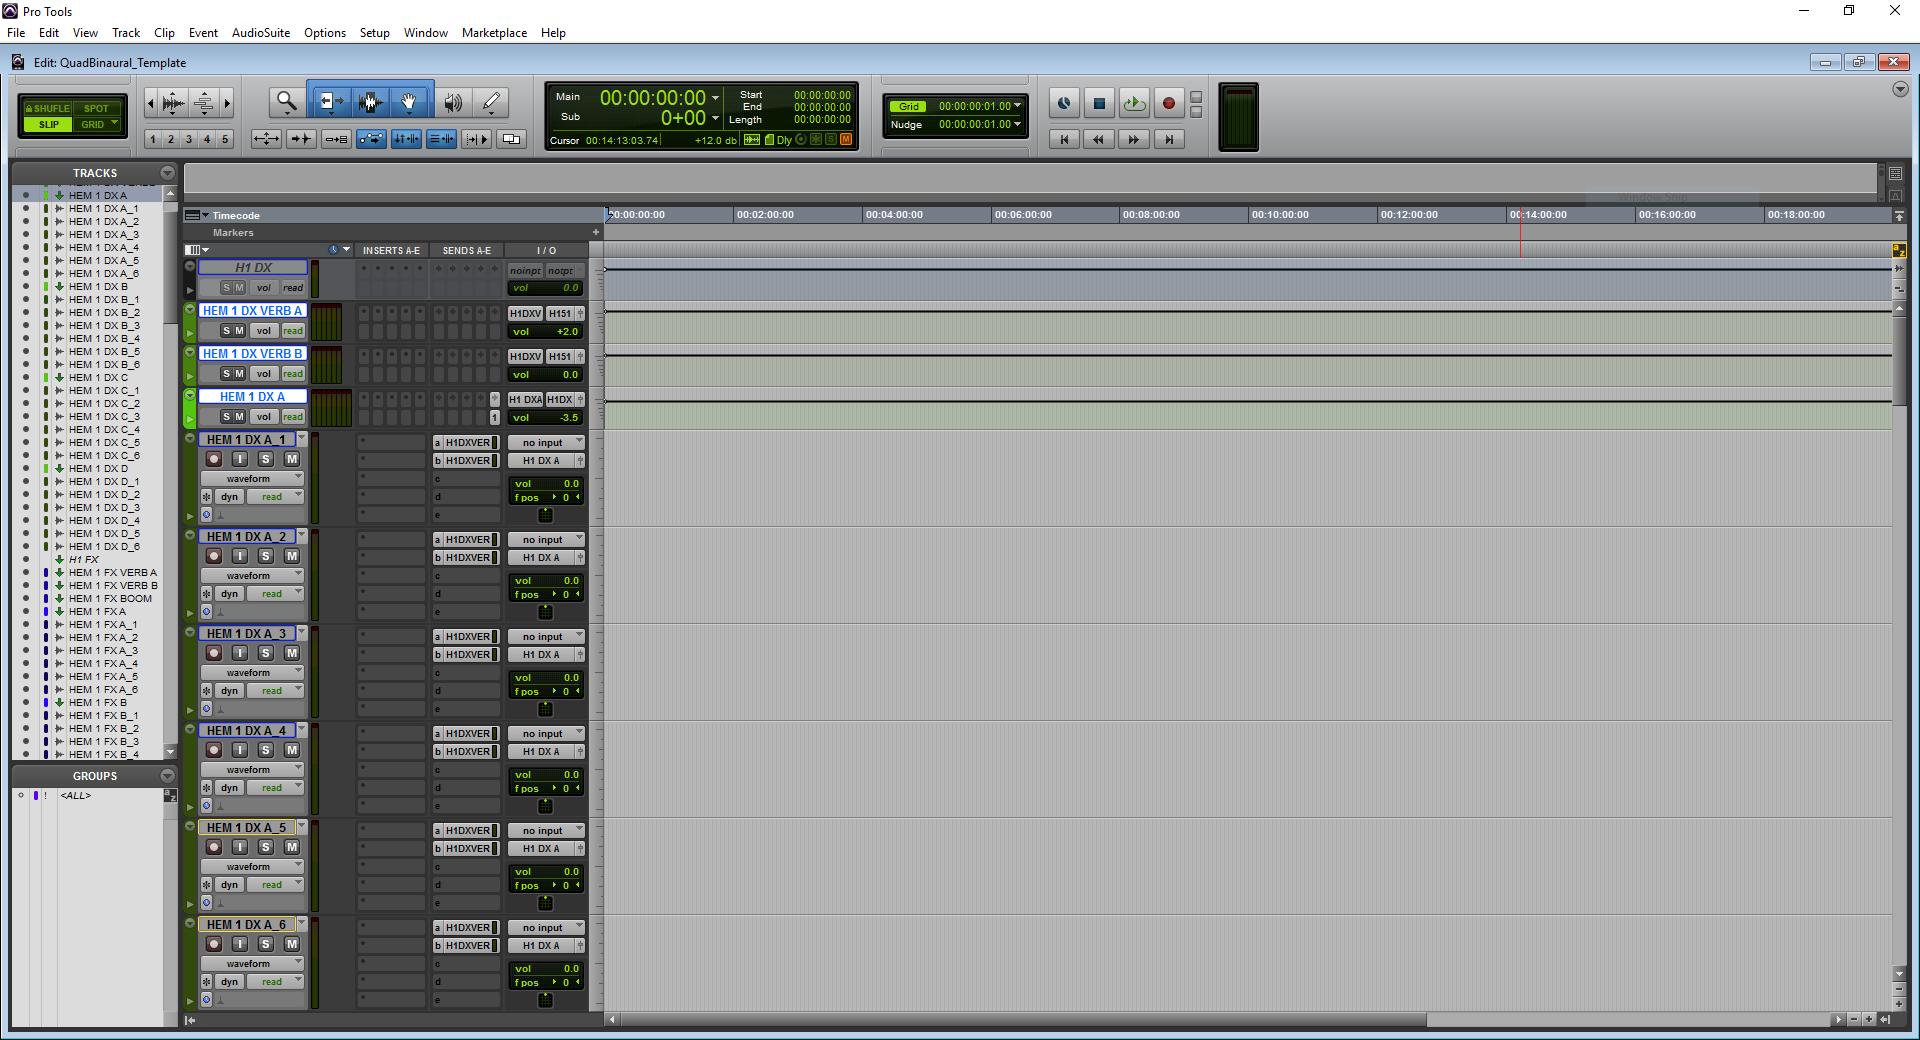 A screenshot of Pro Tools showing the dialog predub